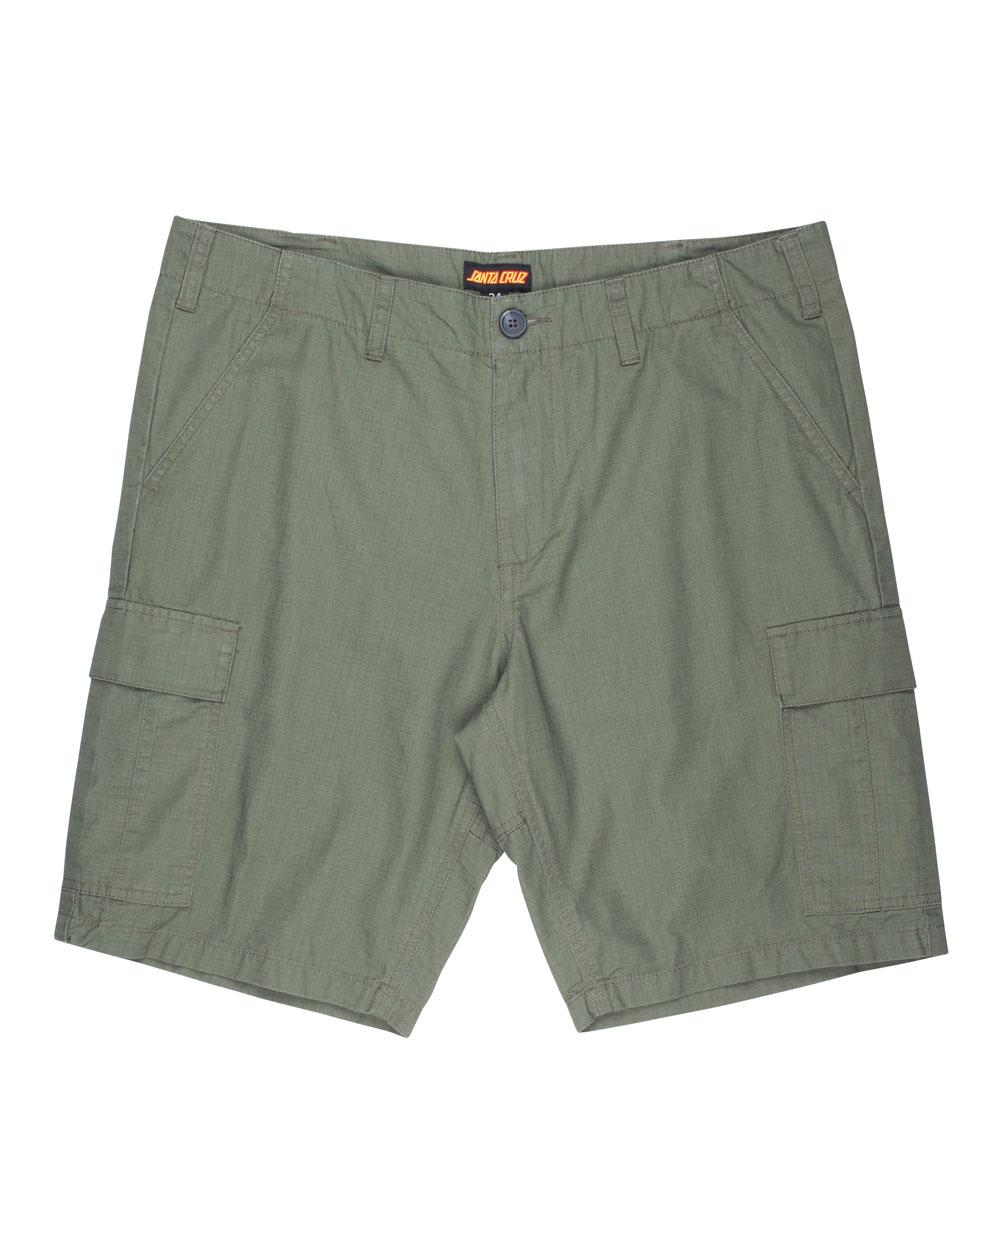 Santa Cruz Men's Shorts Defeat Workshort Military Green